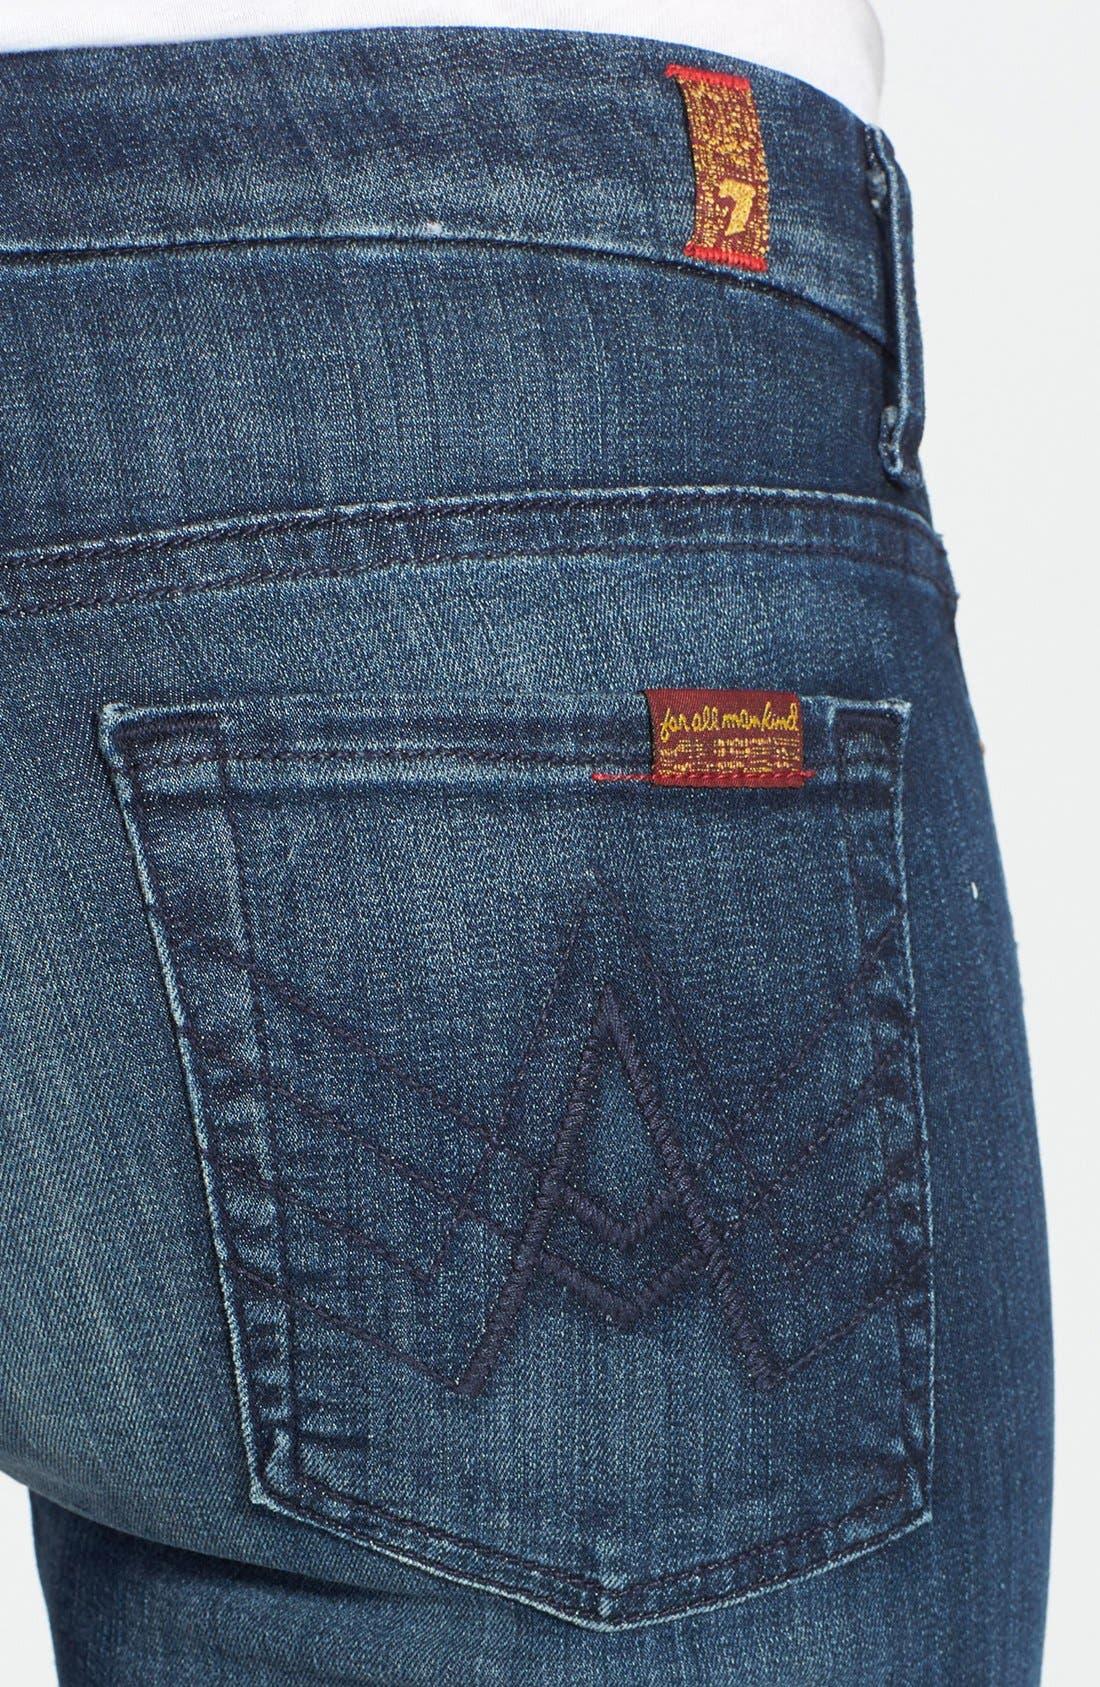 Alternate Image 3  - 7 For All Mankind® 'A-Pocket' Bootcut Jeans (Dark Destroy)